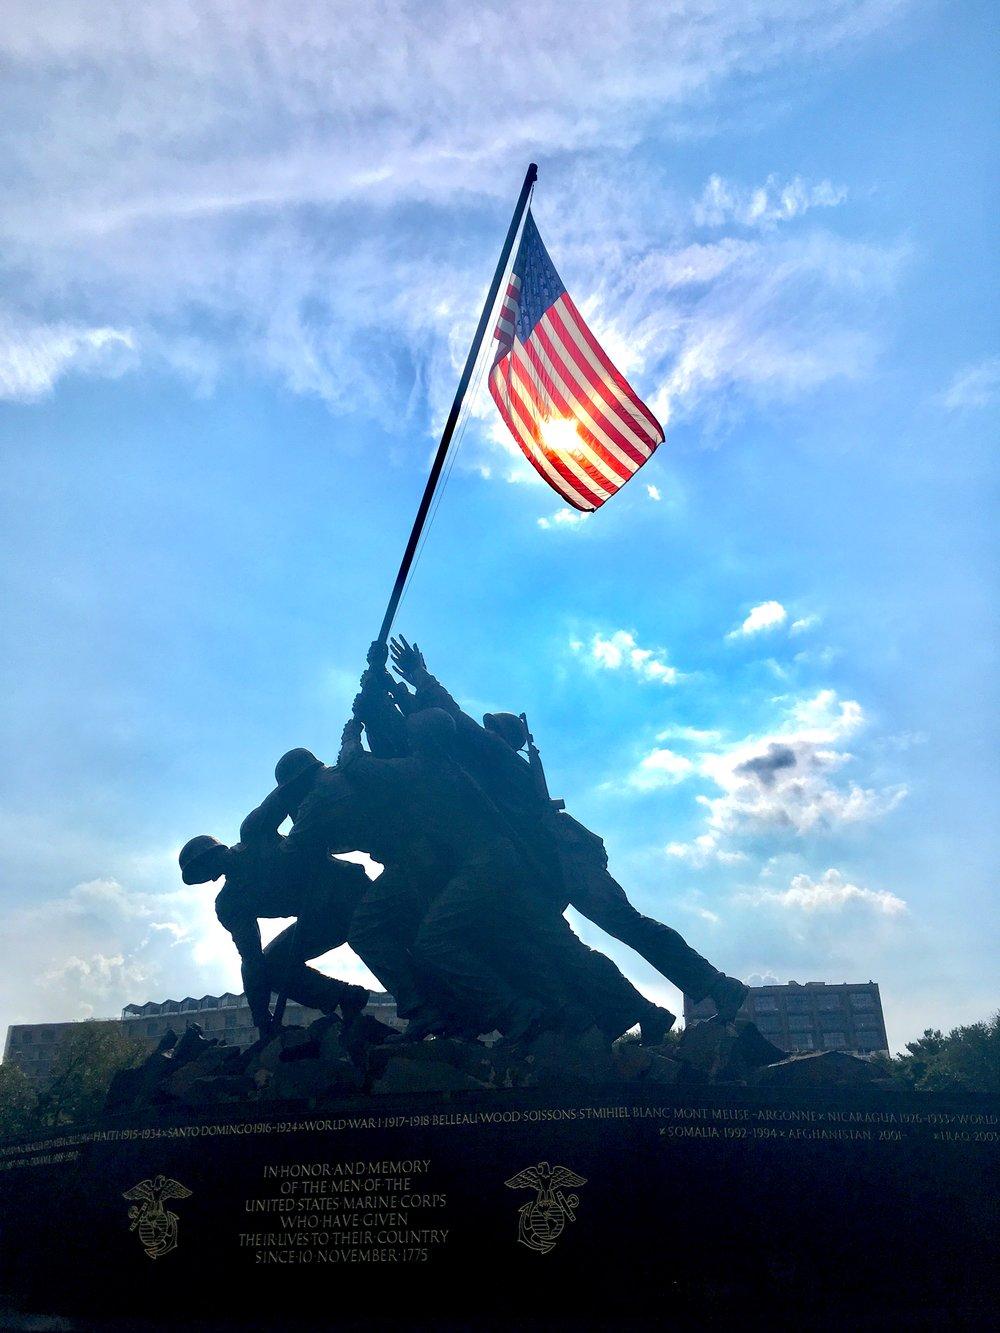 Iwo Jima Memorial at Arlington National Cemetery